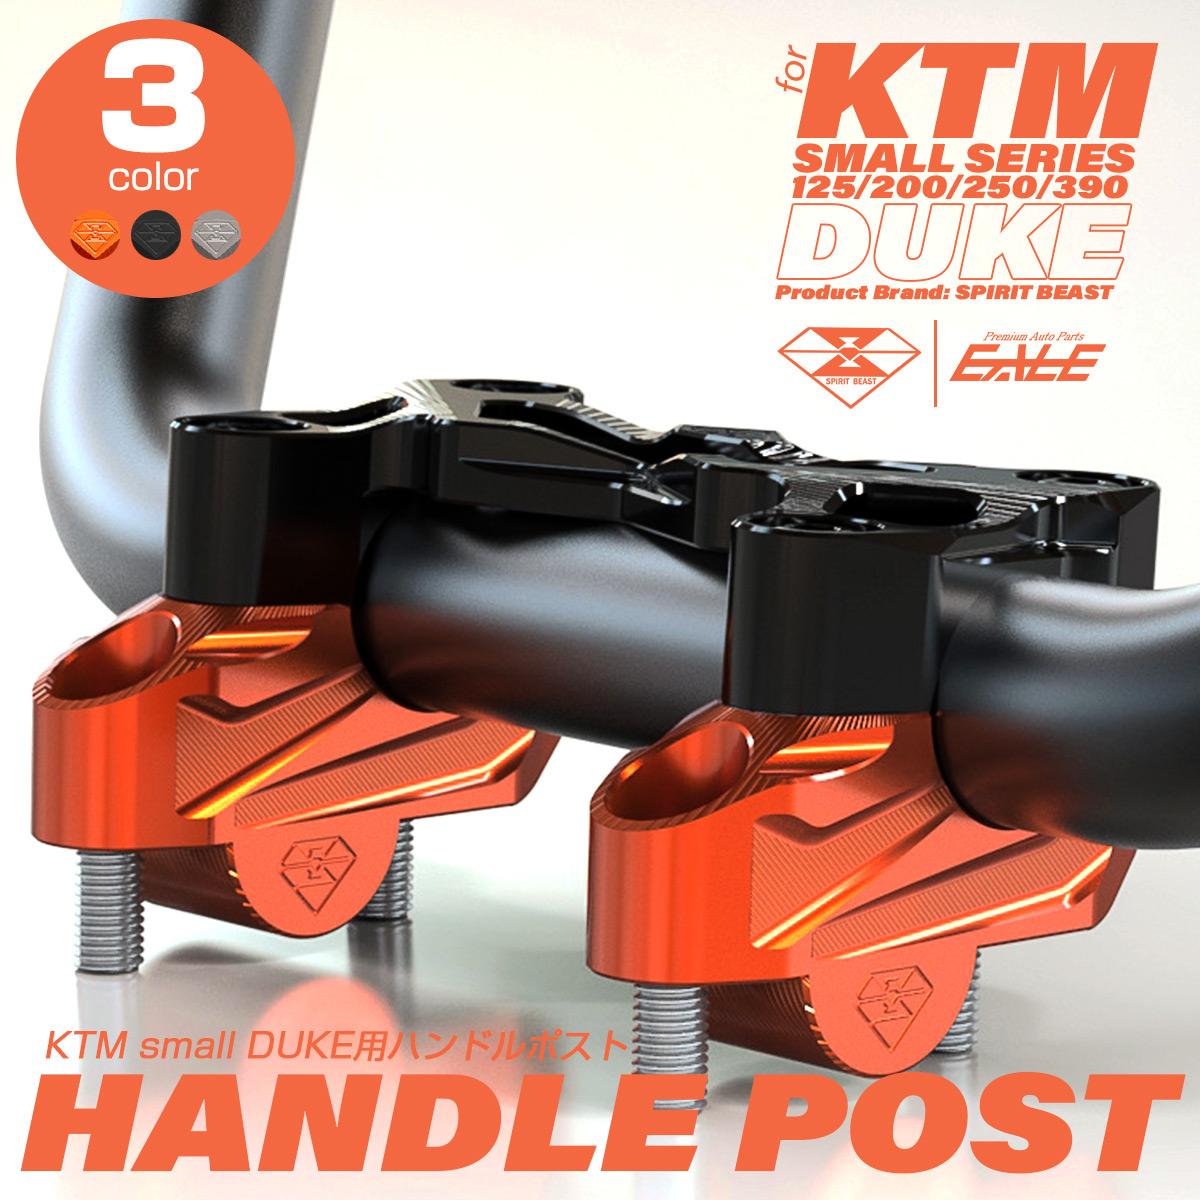 KTM DUKE 125 200 250 390専用 ハンドルポスト T6アルミ アルマイト スモールシリーズ 全年式対応 バイク 3色 S-938